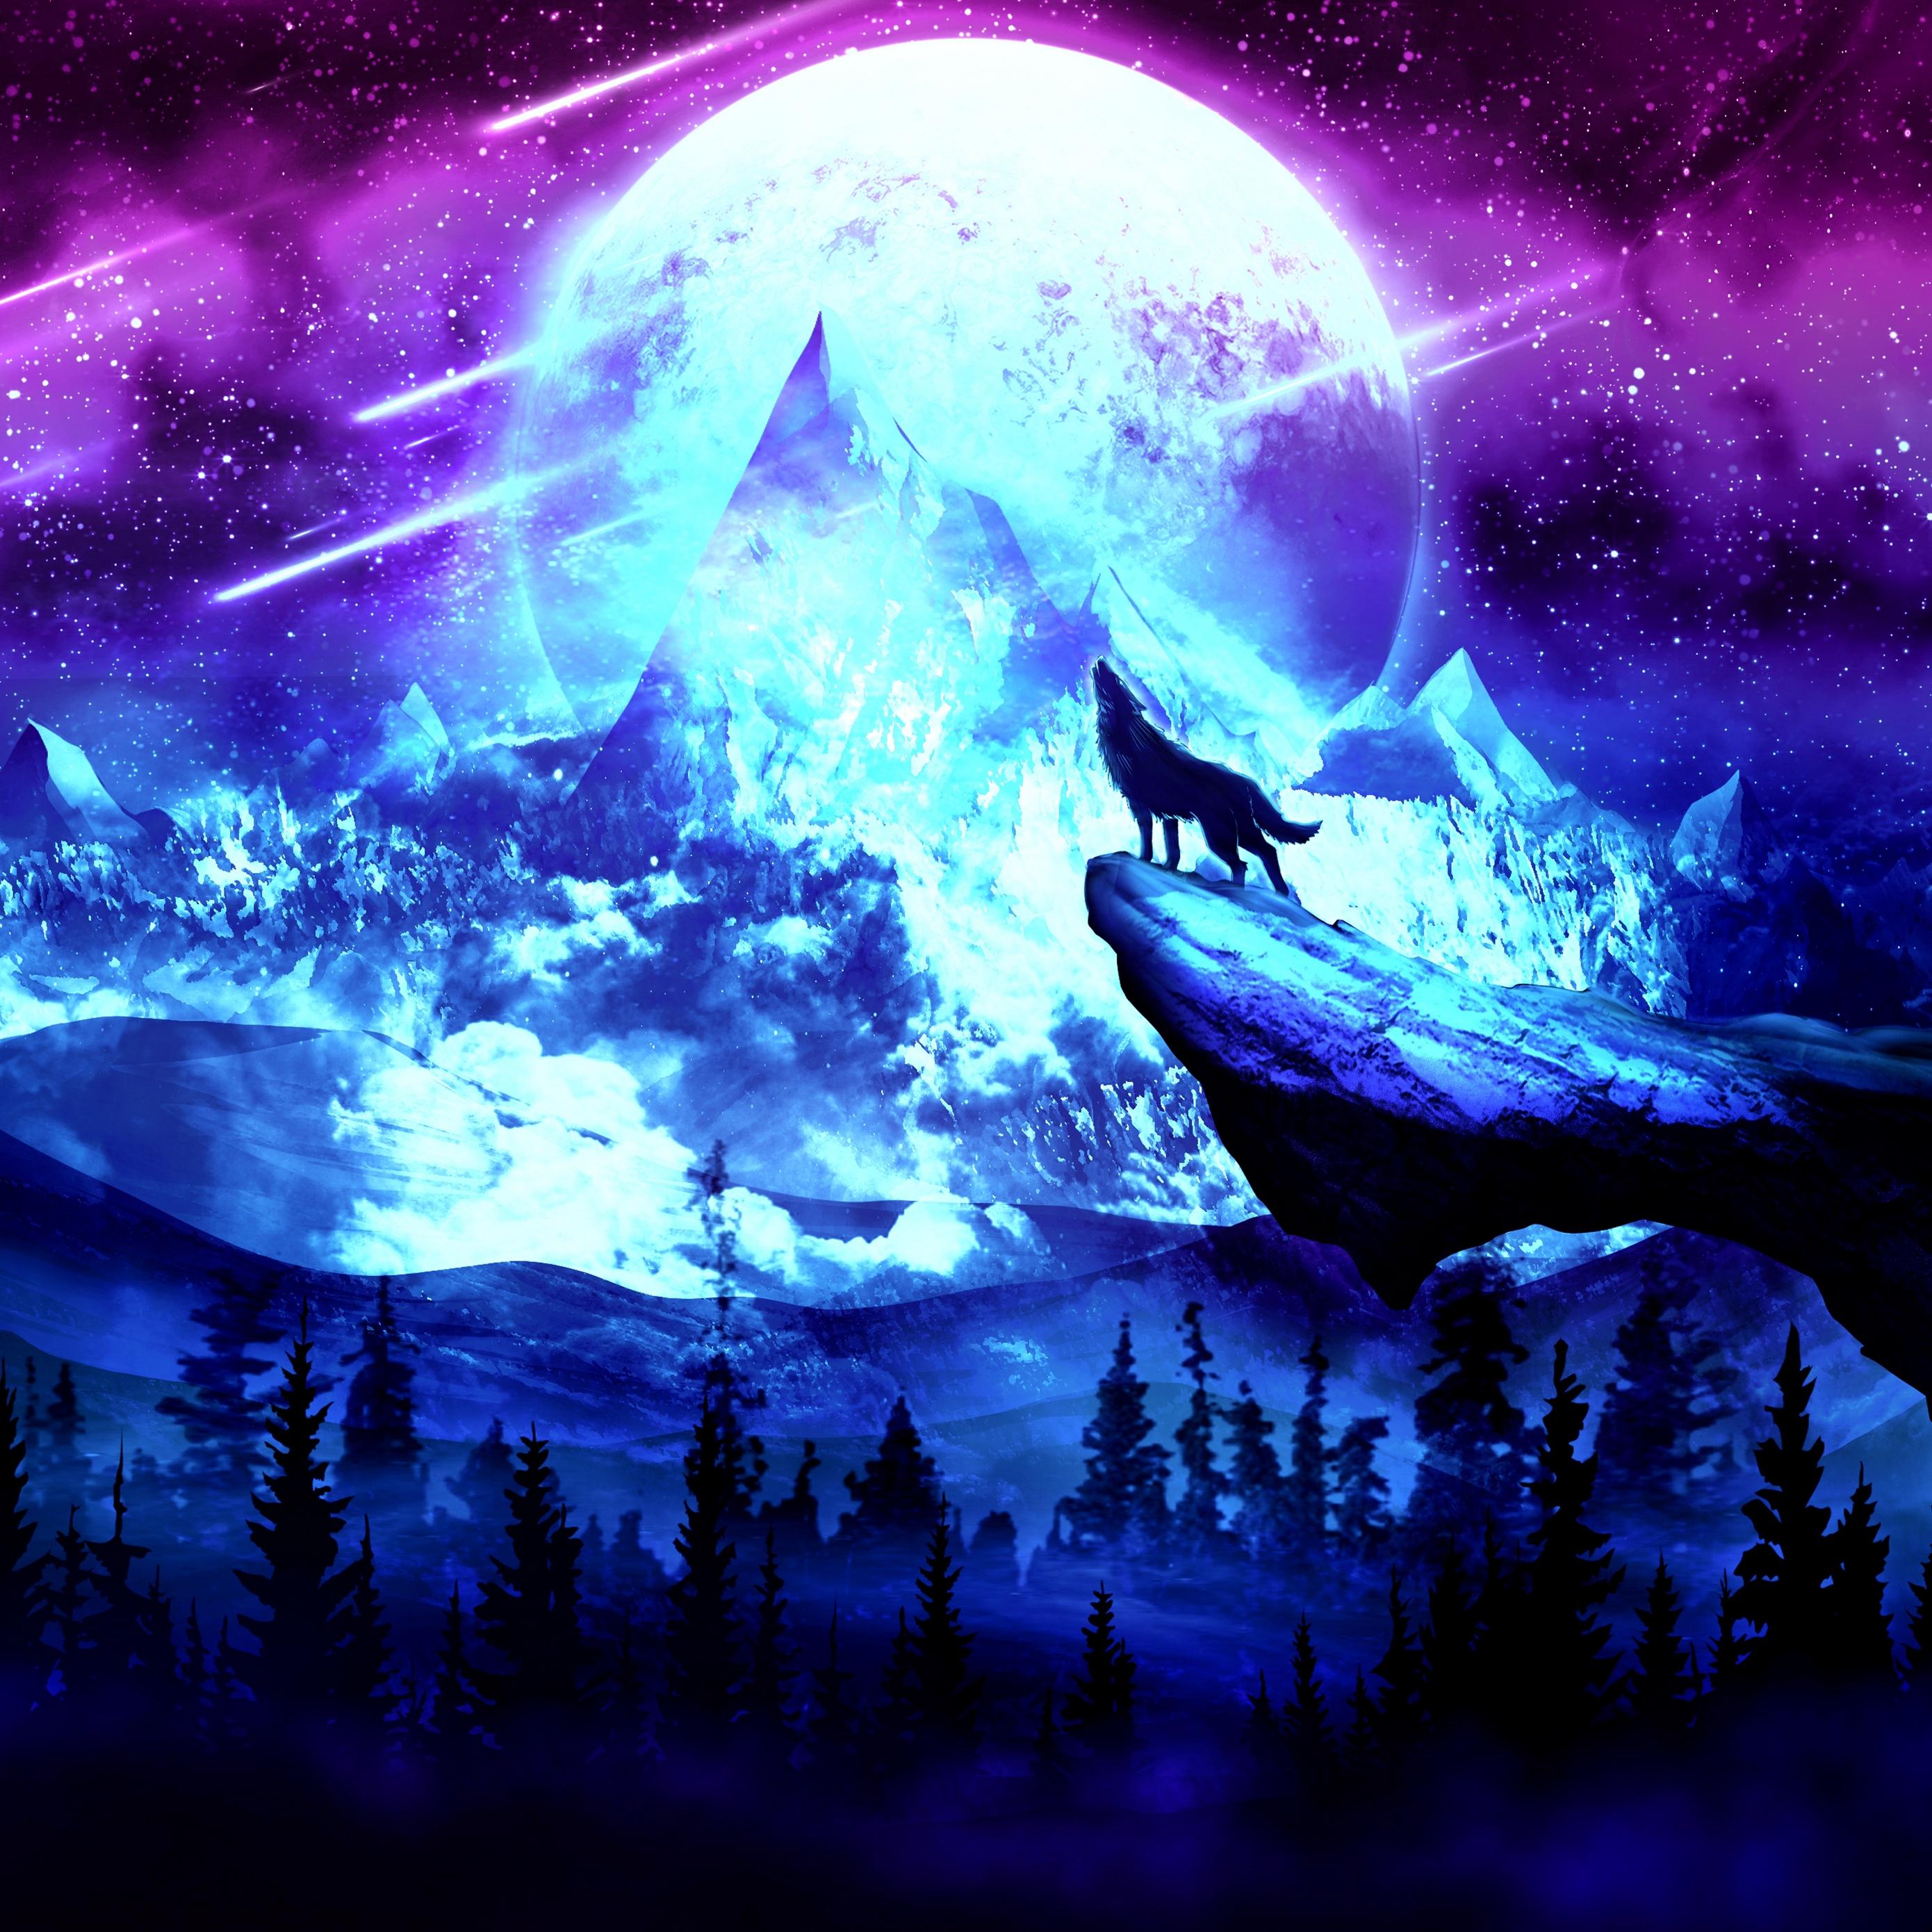 Download wallpaper 2780x2780 wolf moon night mountains art 2780x2780